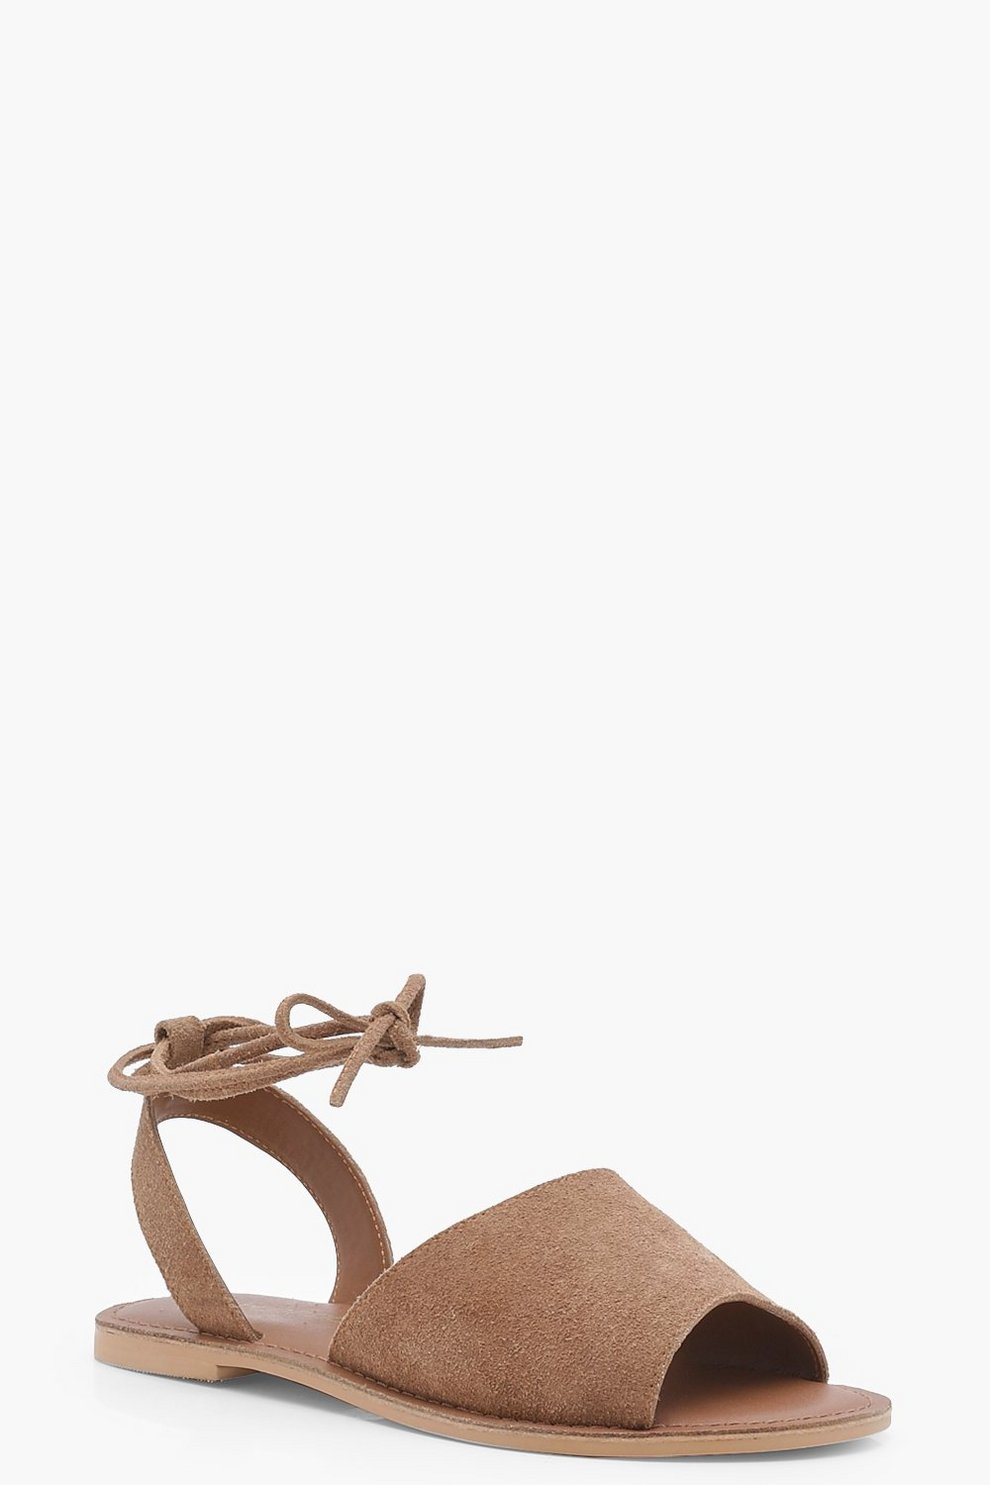 0992539d27b Wide Fit Suede Peeptoe Wrap Ankle Strap Sandals